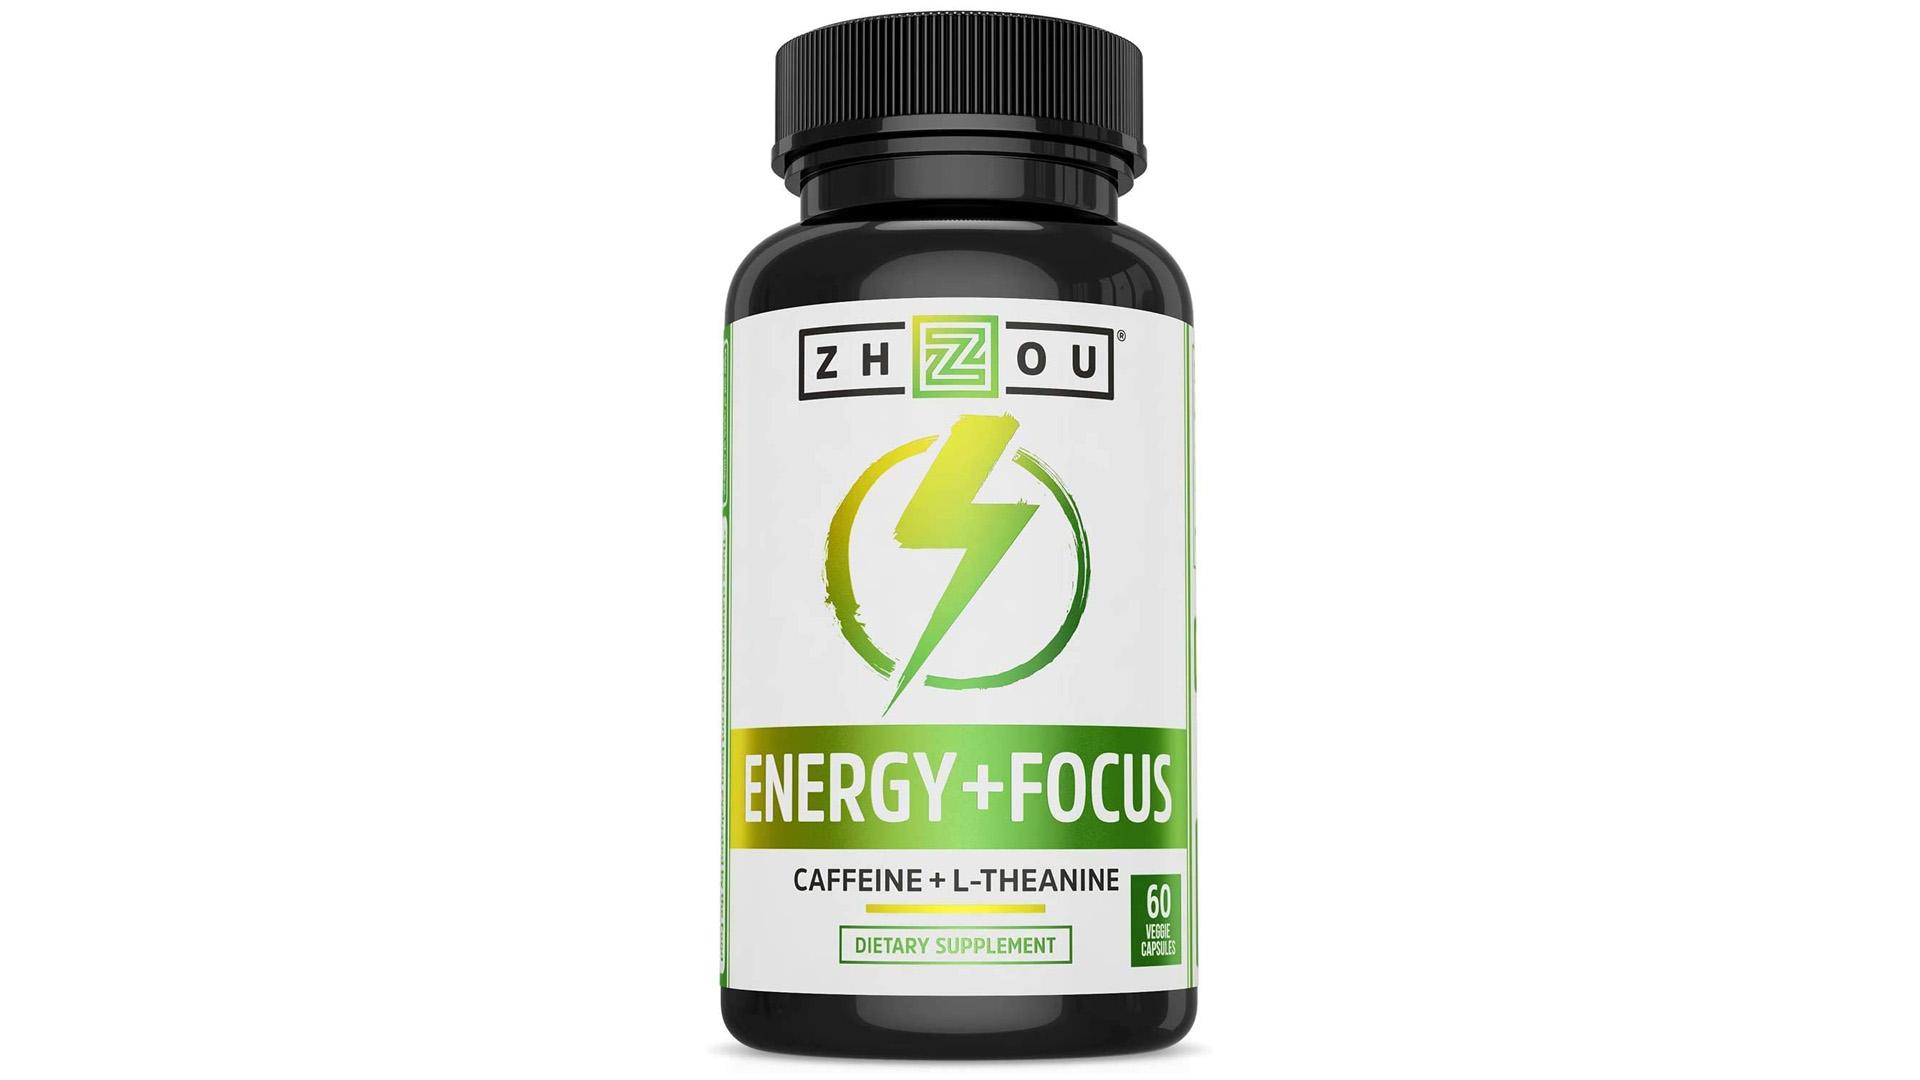 Zhou Energy Focus